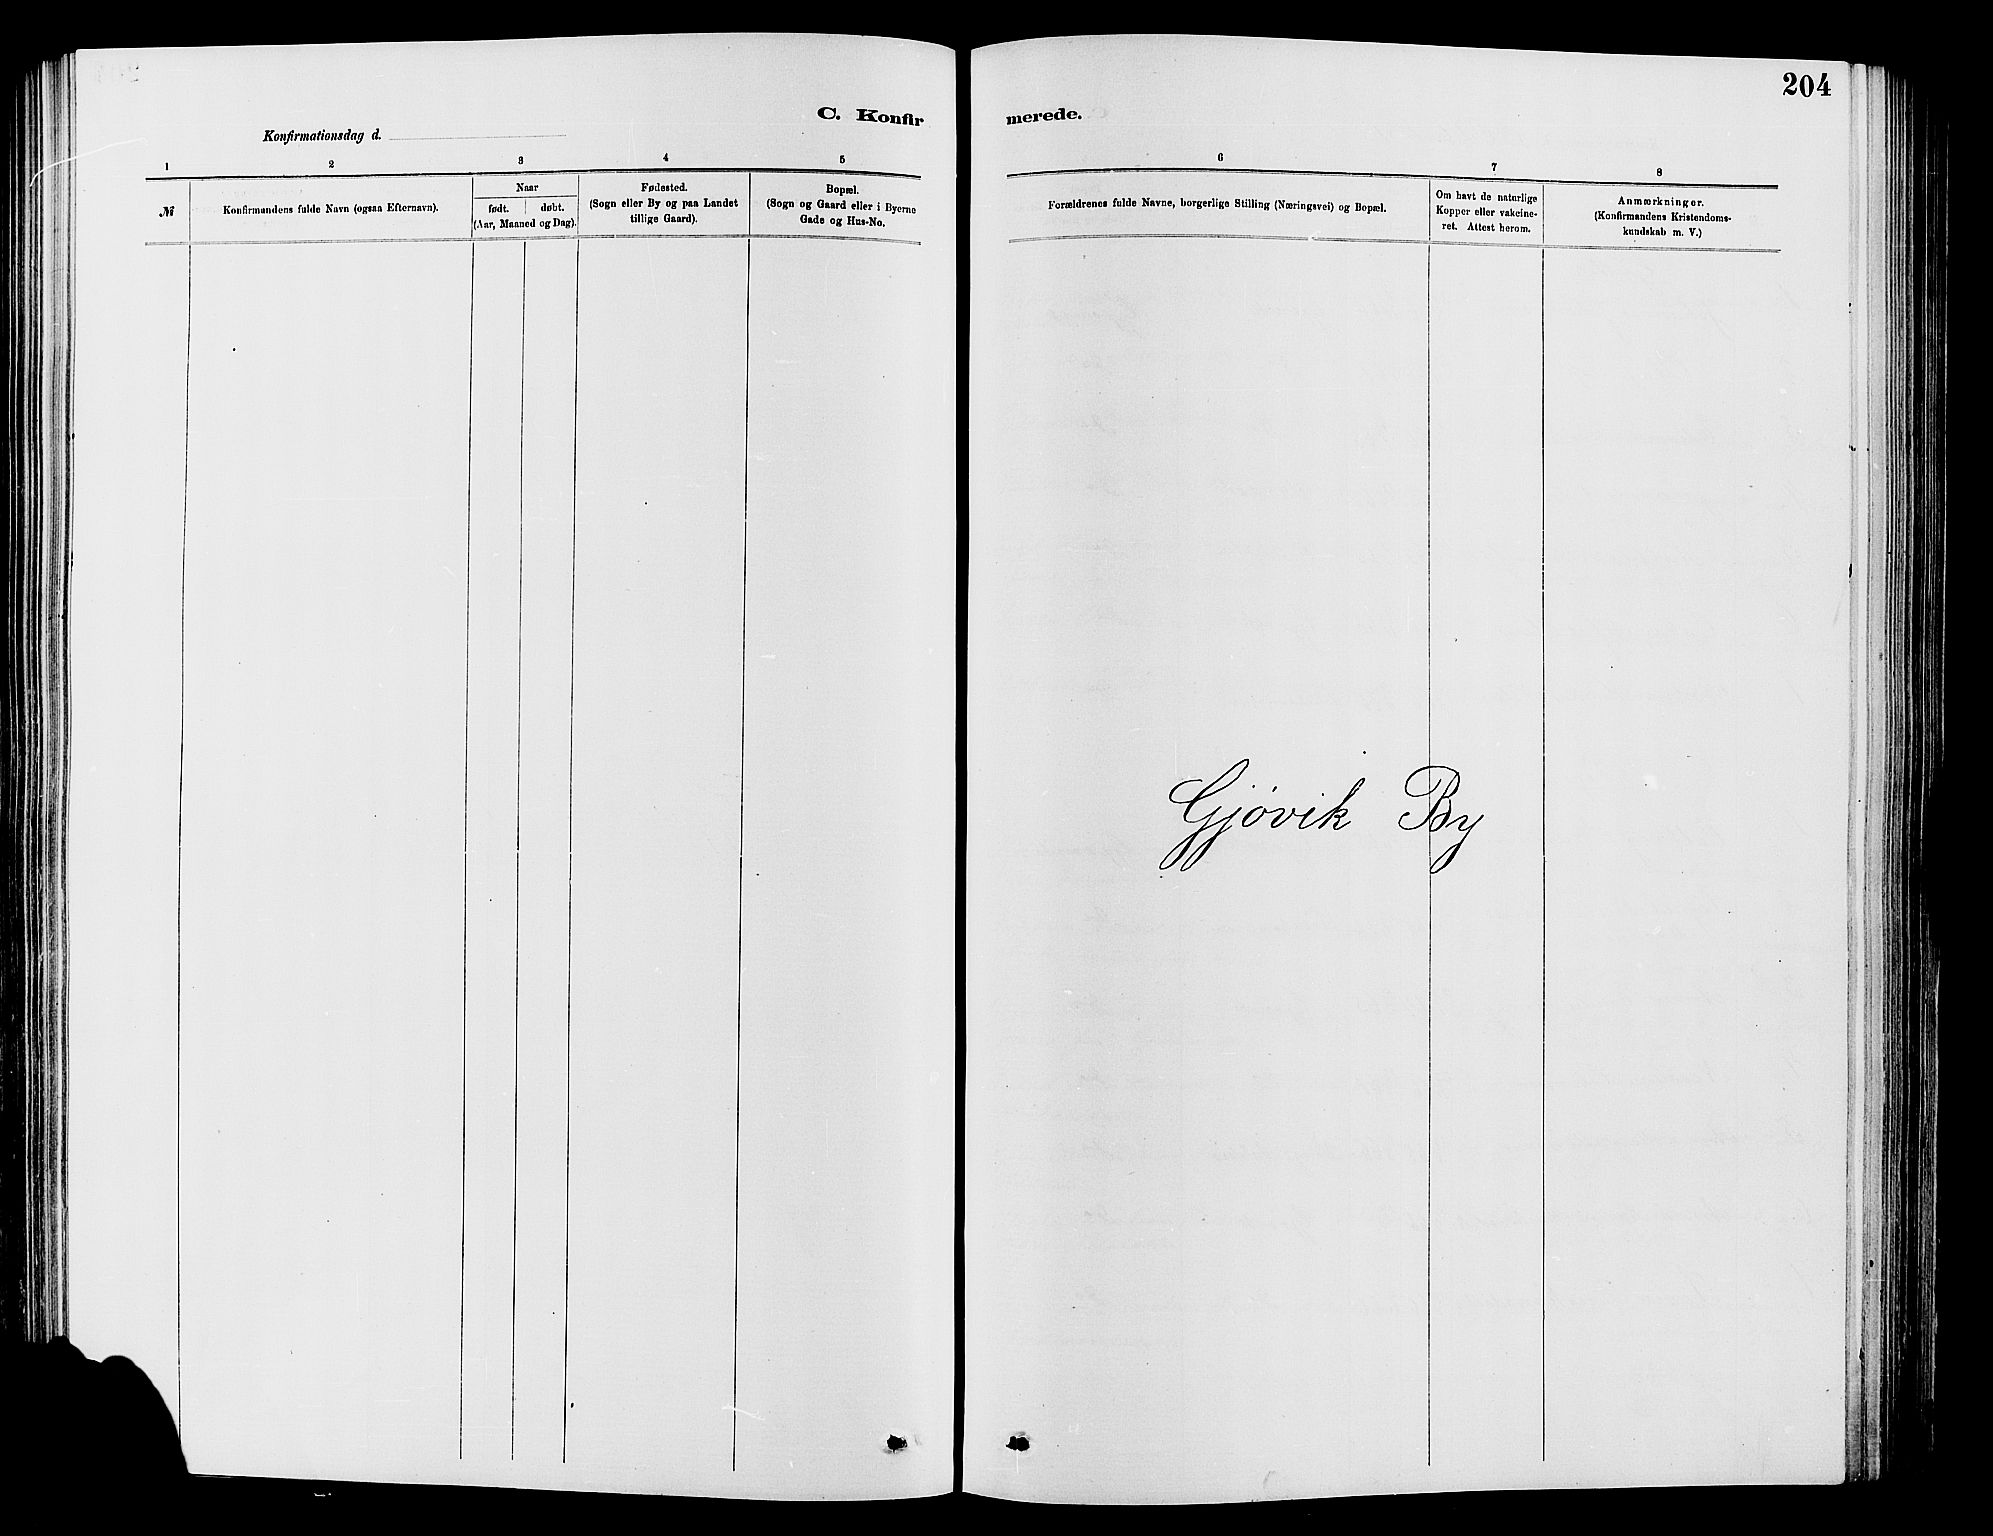 SAH, Vardal prestekontor, H/Ha/Hab/L0007: Klokkerbok nr. 7 /2, 1881-1895, s. 204